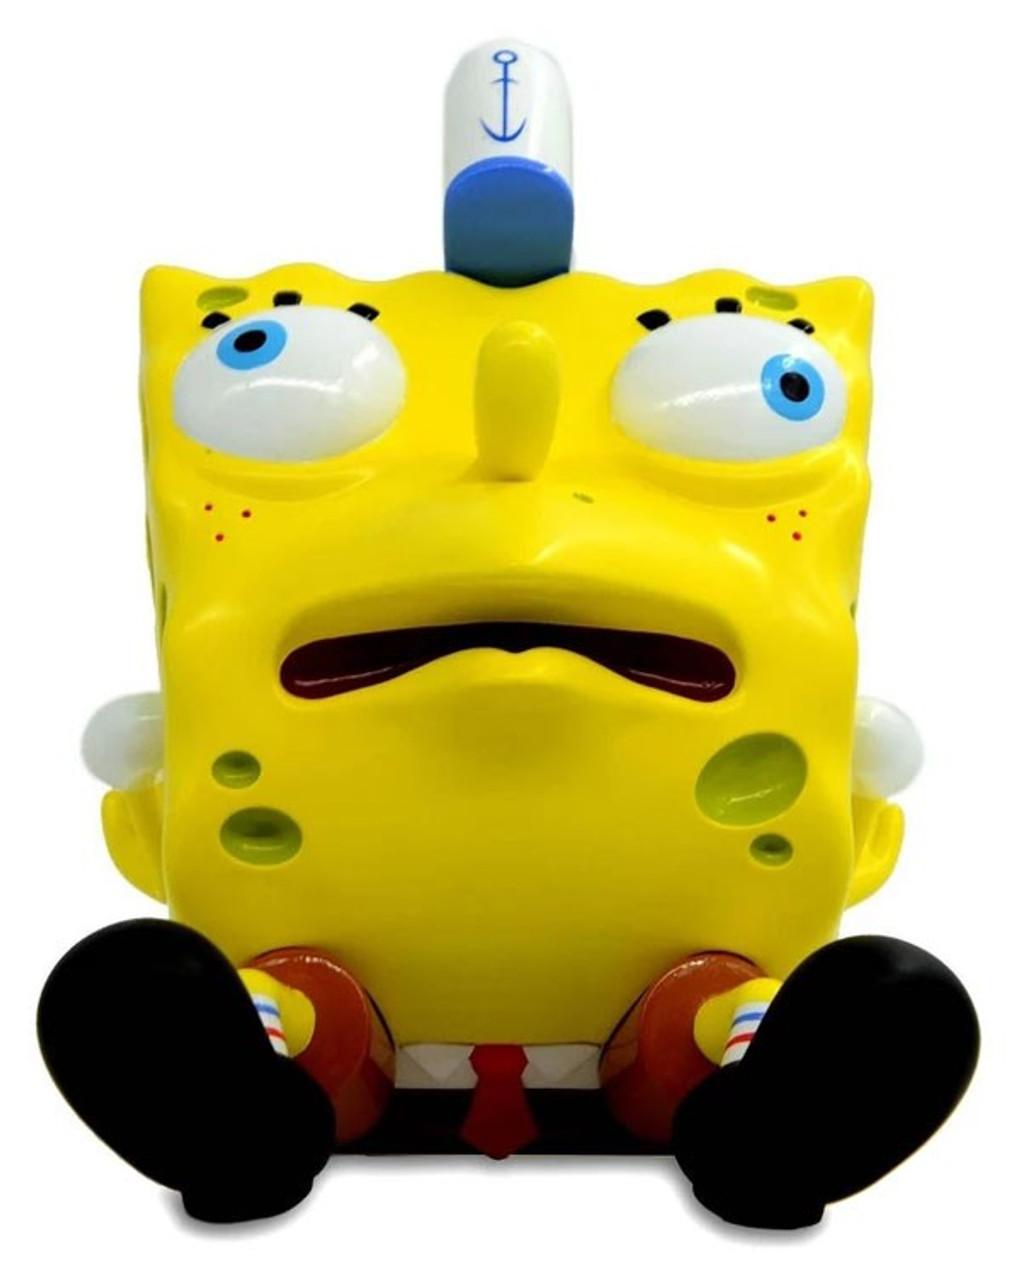 Nickelodeon Spongebob Masterpiece Meme MOCKING SPONGEBOB